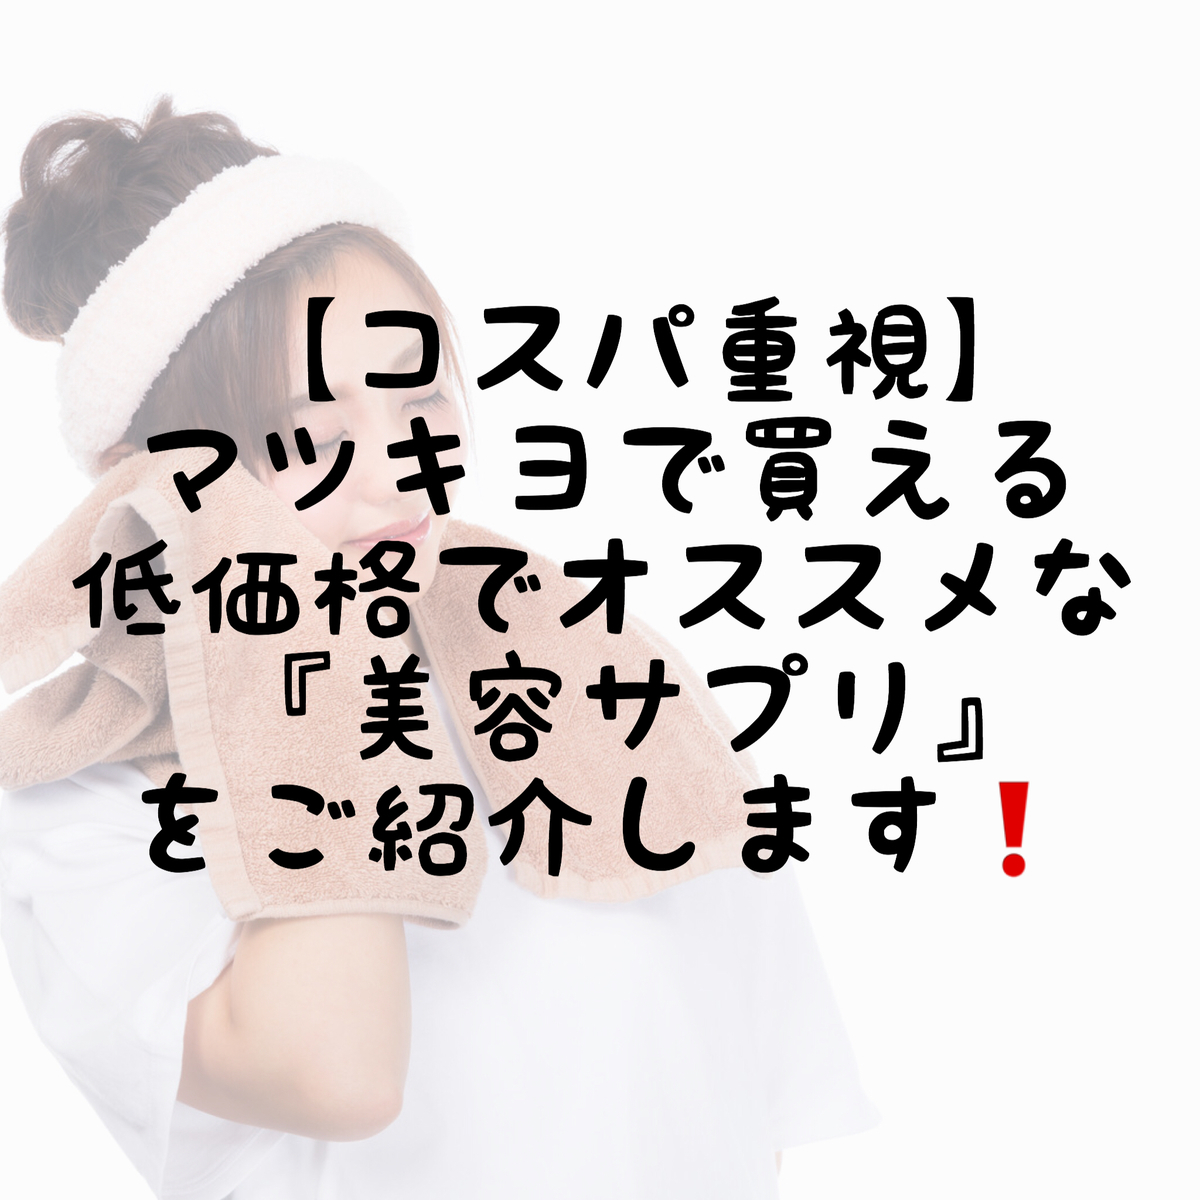 f:id:nokonoko_o:20200605165620j:plain